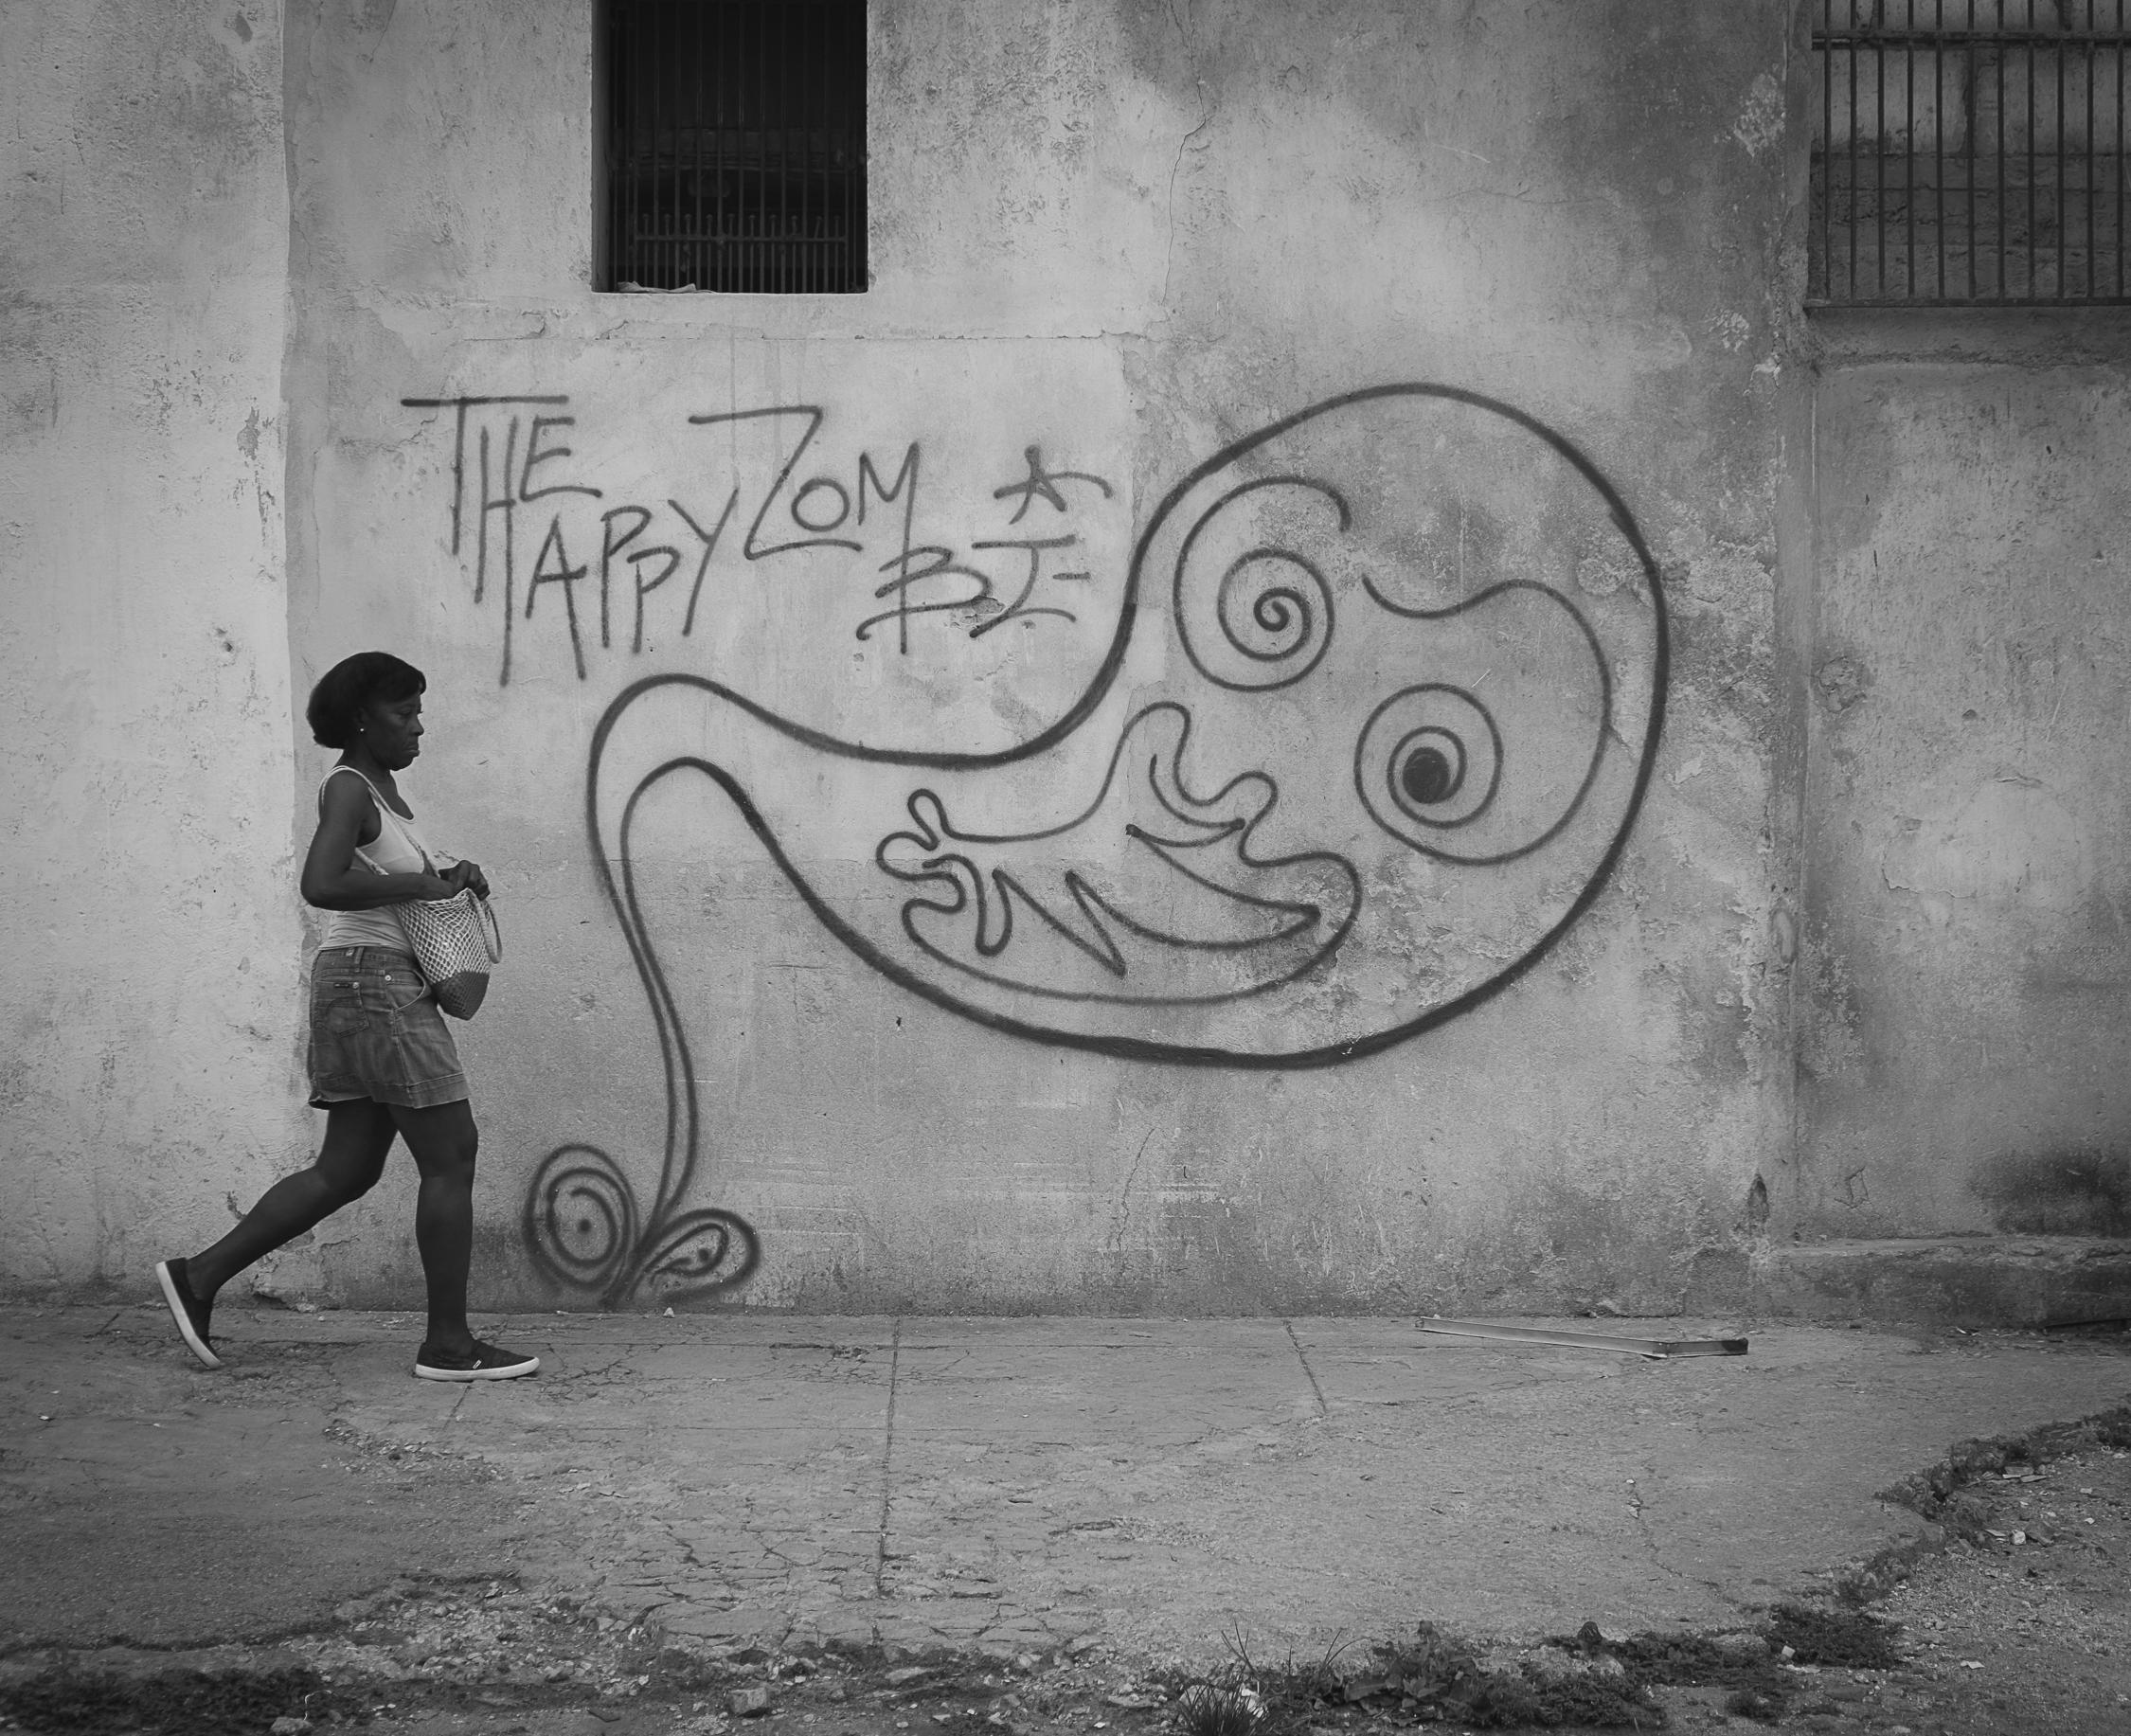 Havana: Street Art